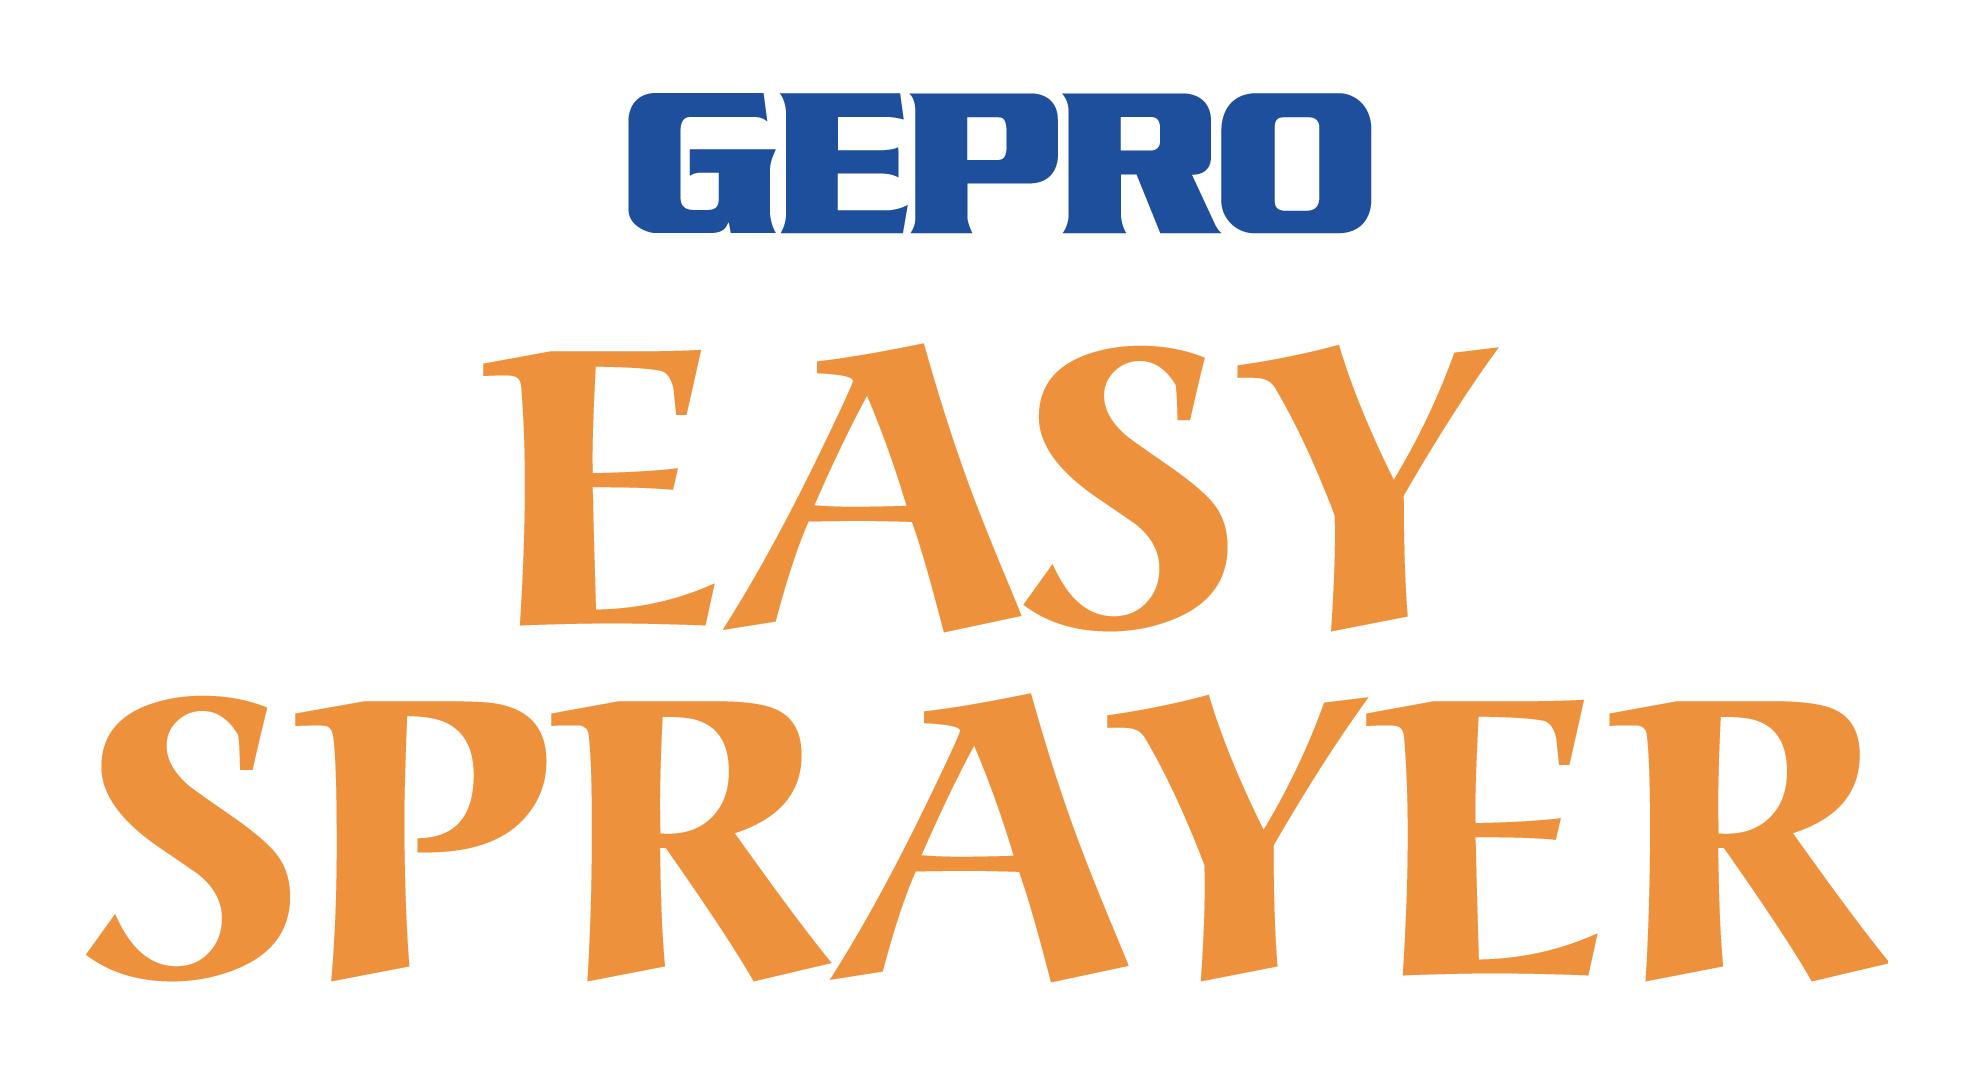 GEPRO Easy Sprayer Logo